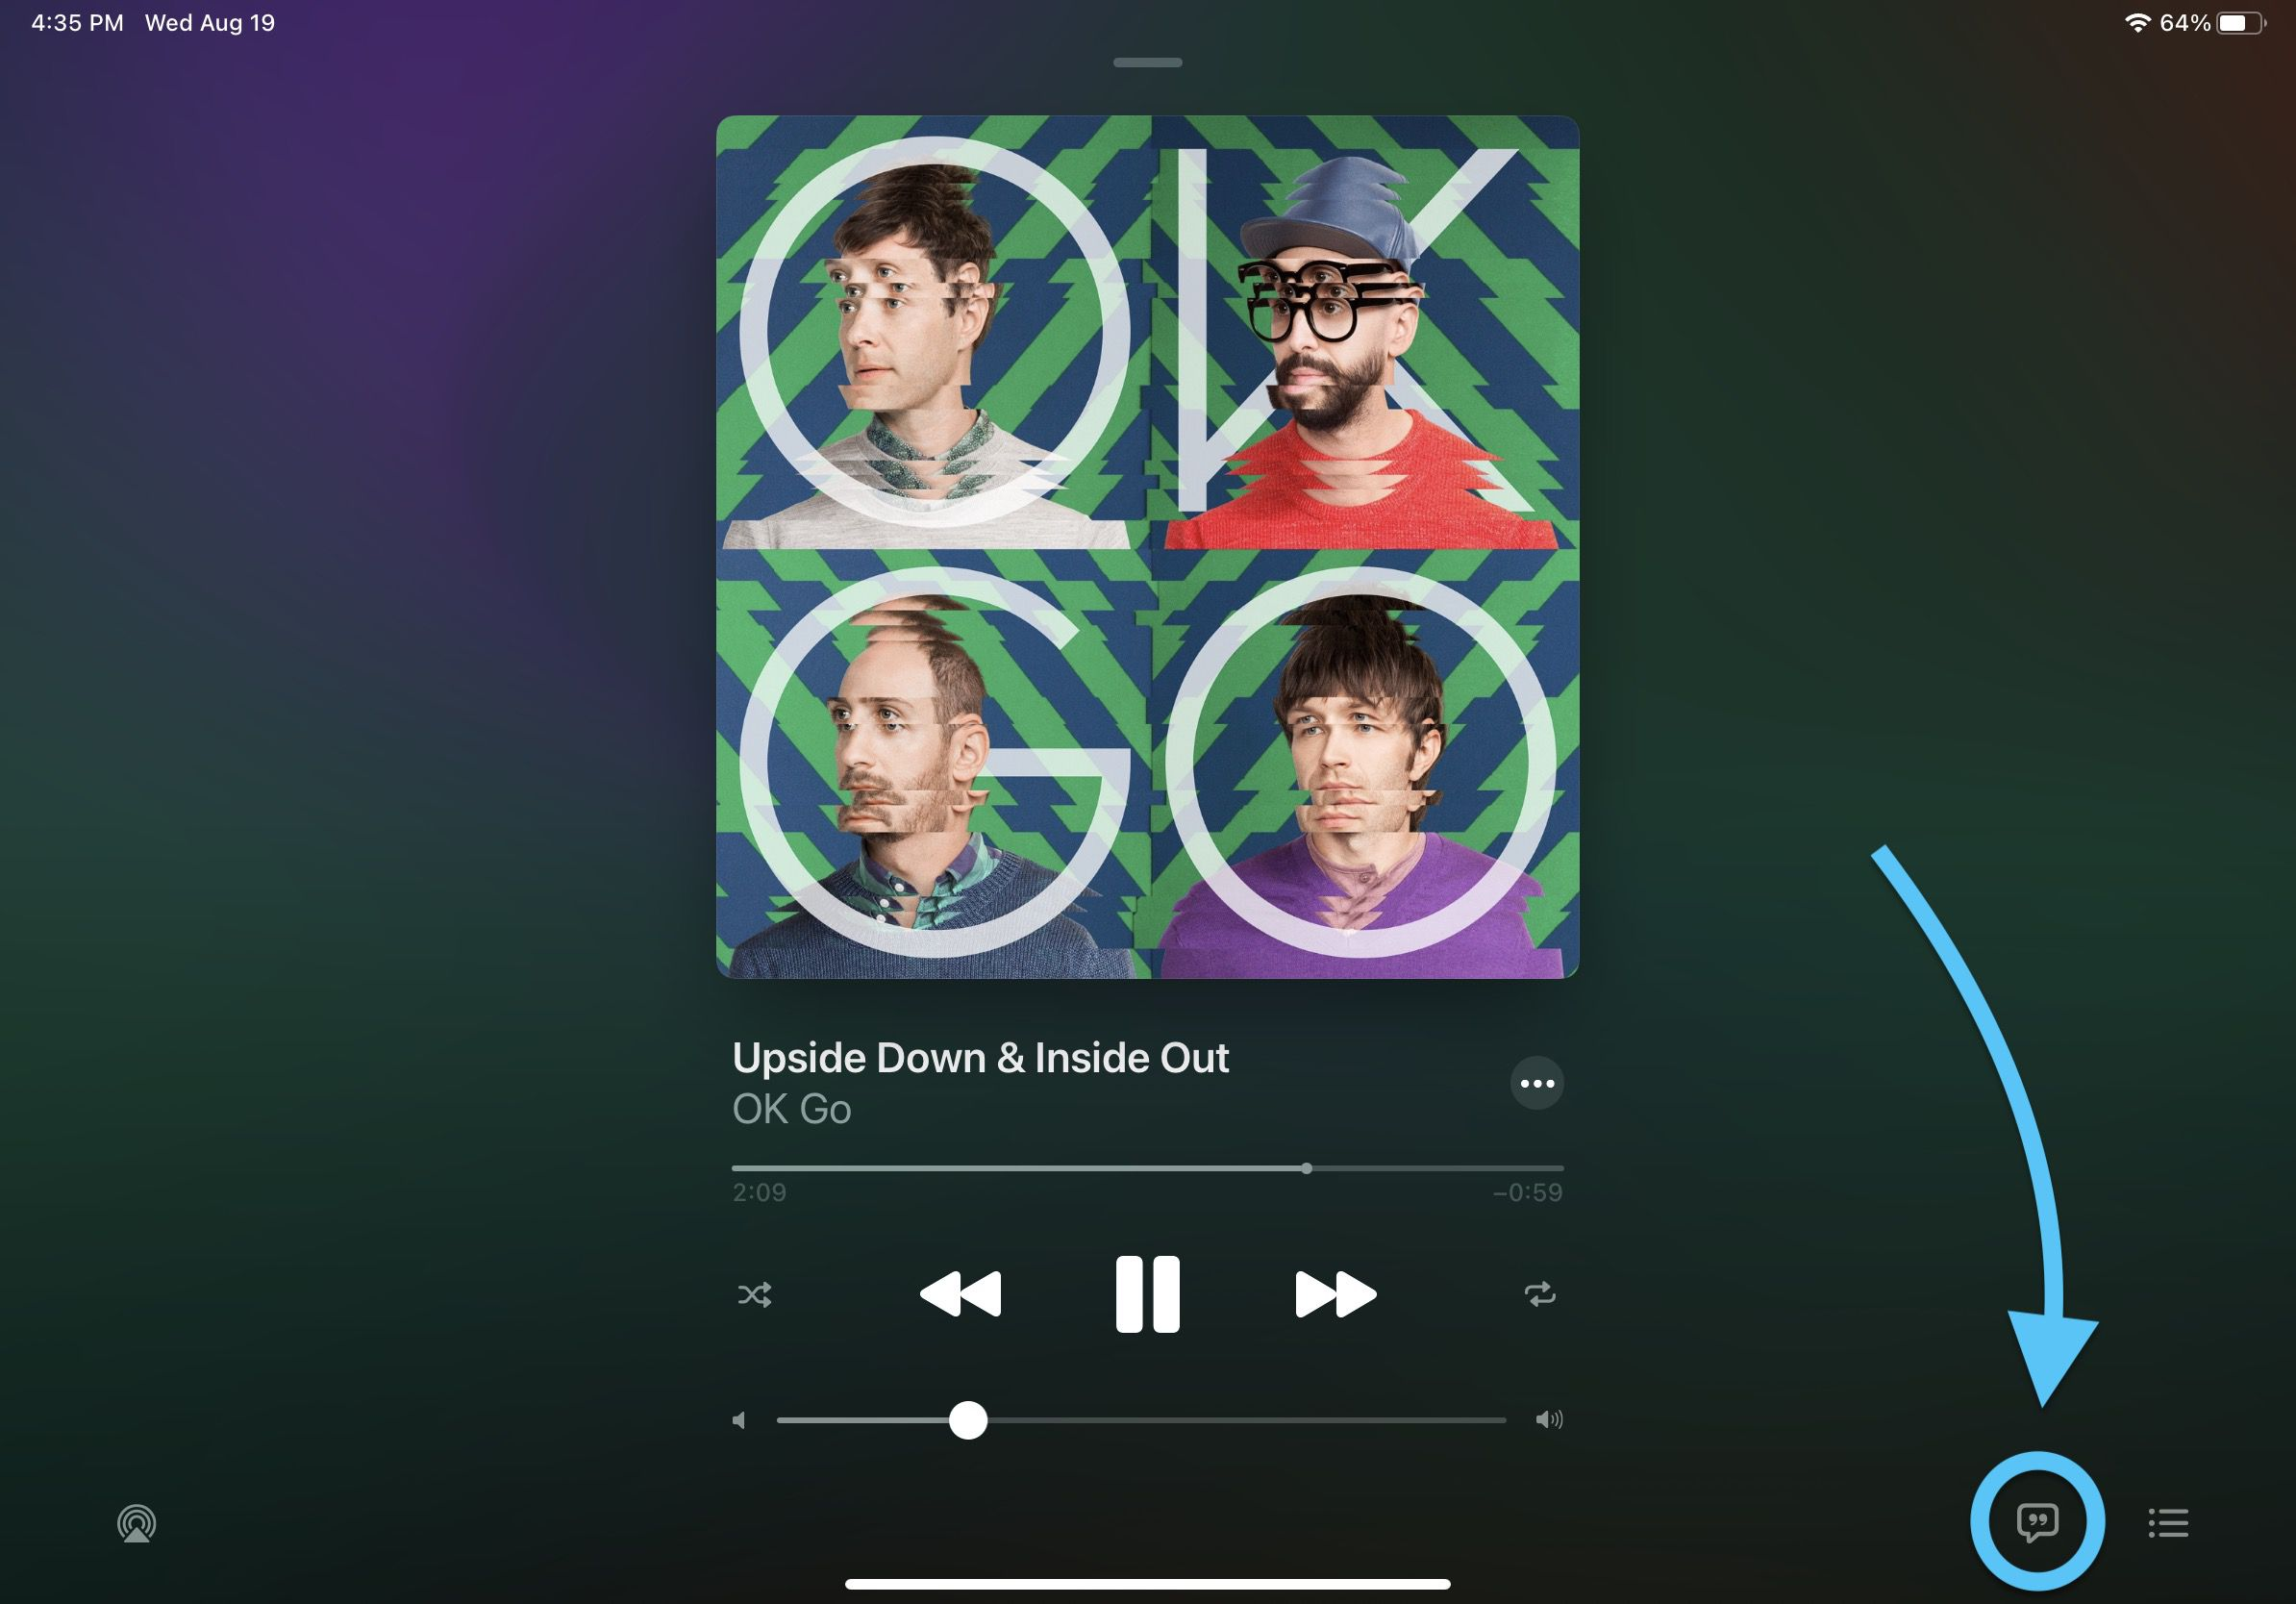 How to use full screen live lyrics on iPad in iOS 14 walkthrough 2